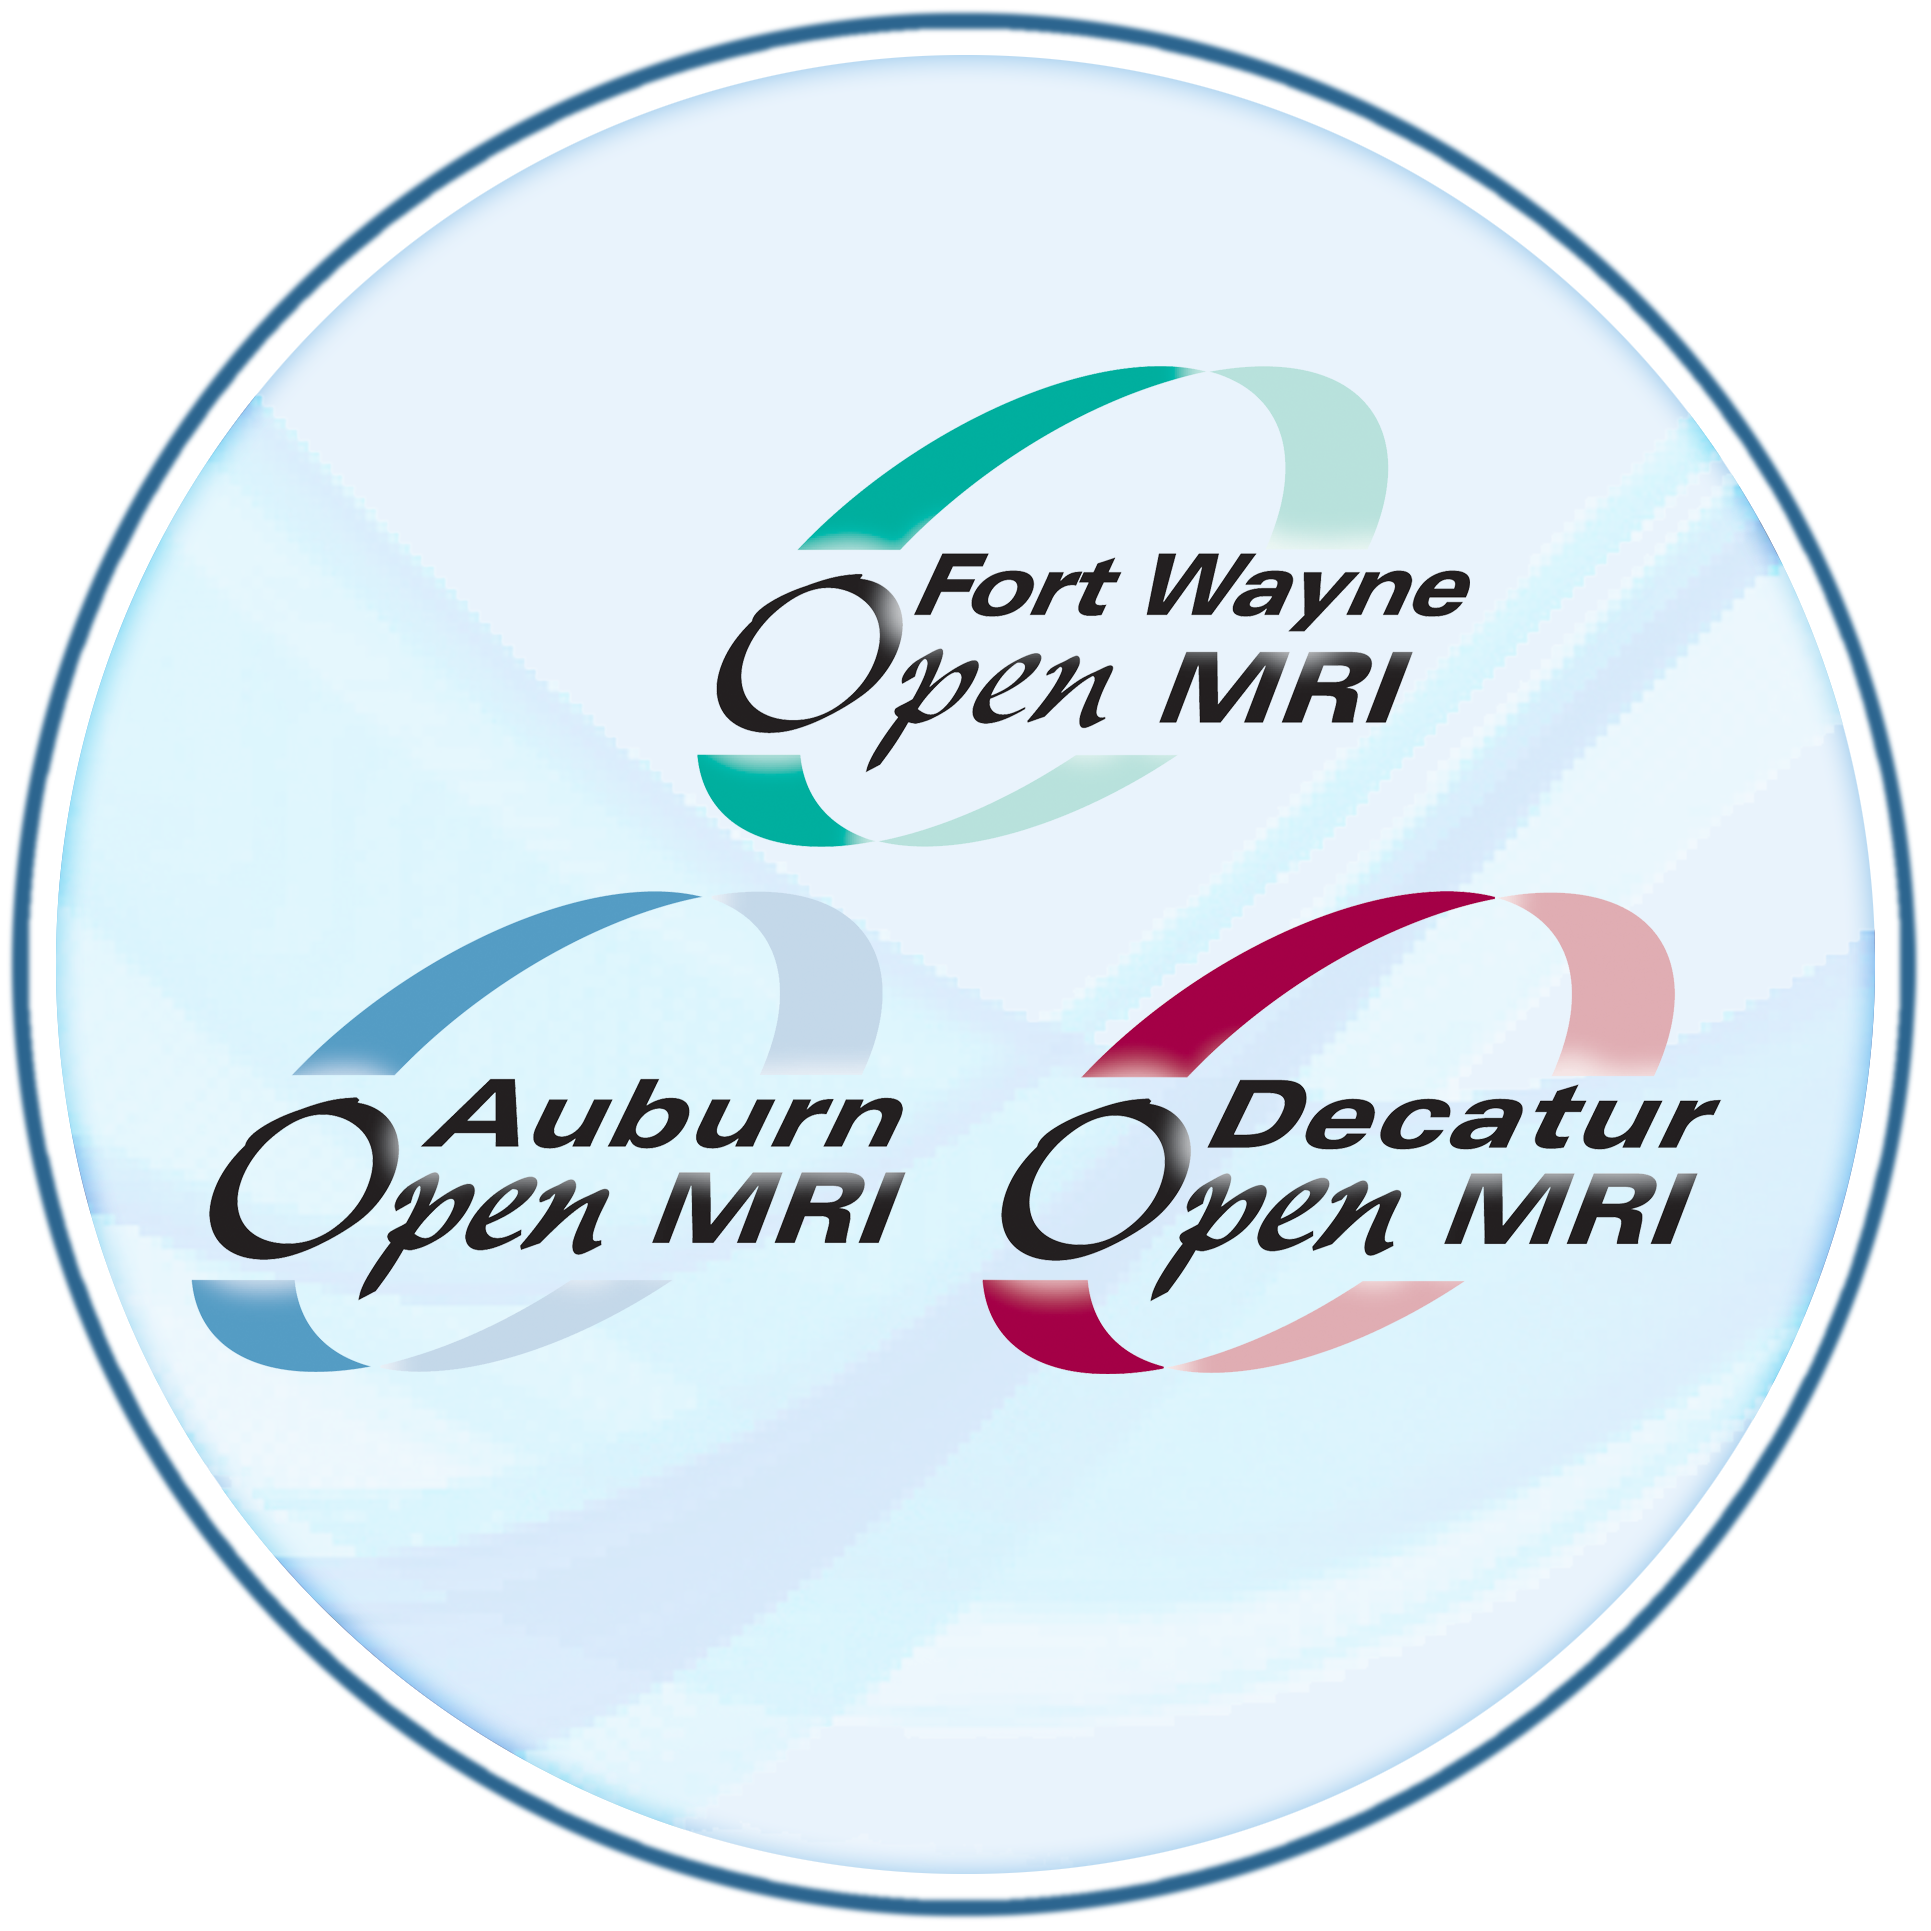 Fort Wayne Open MRI